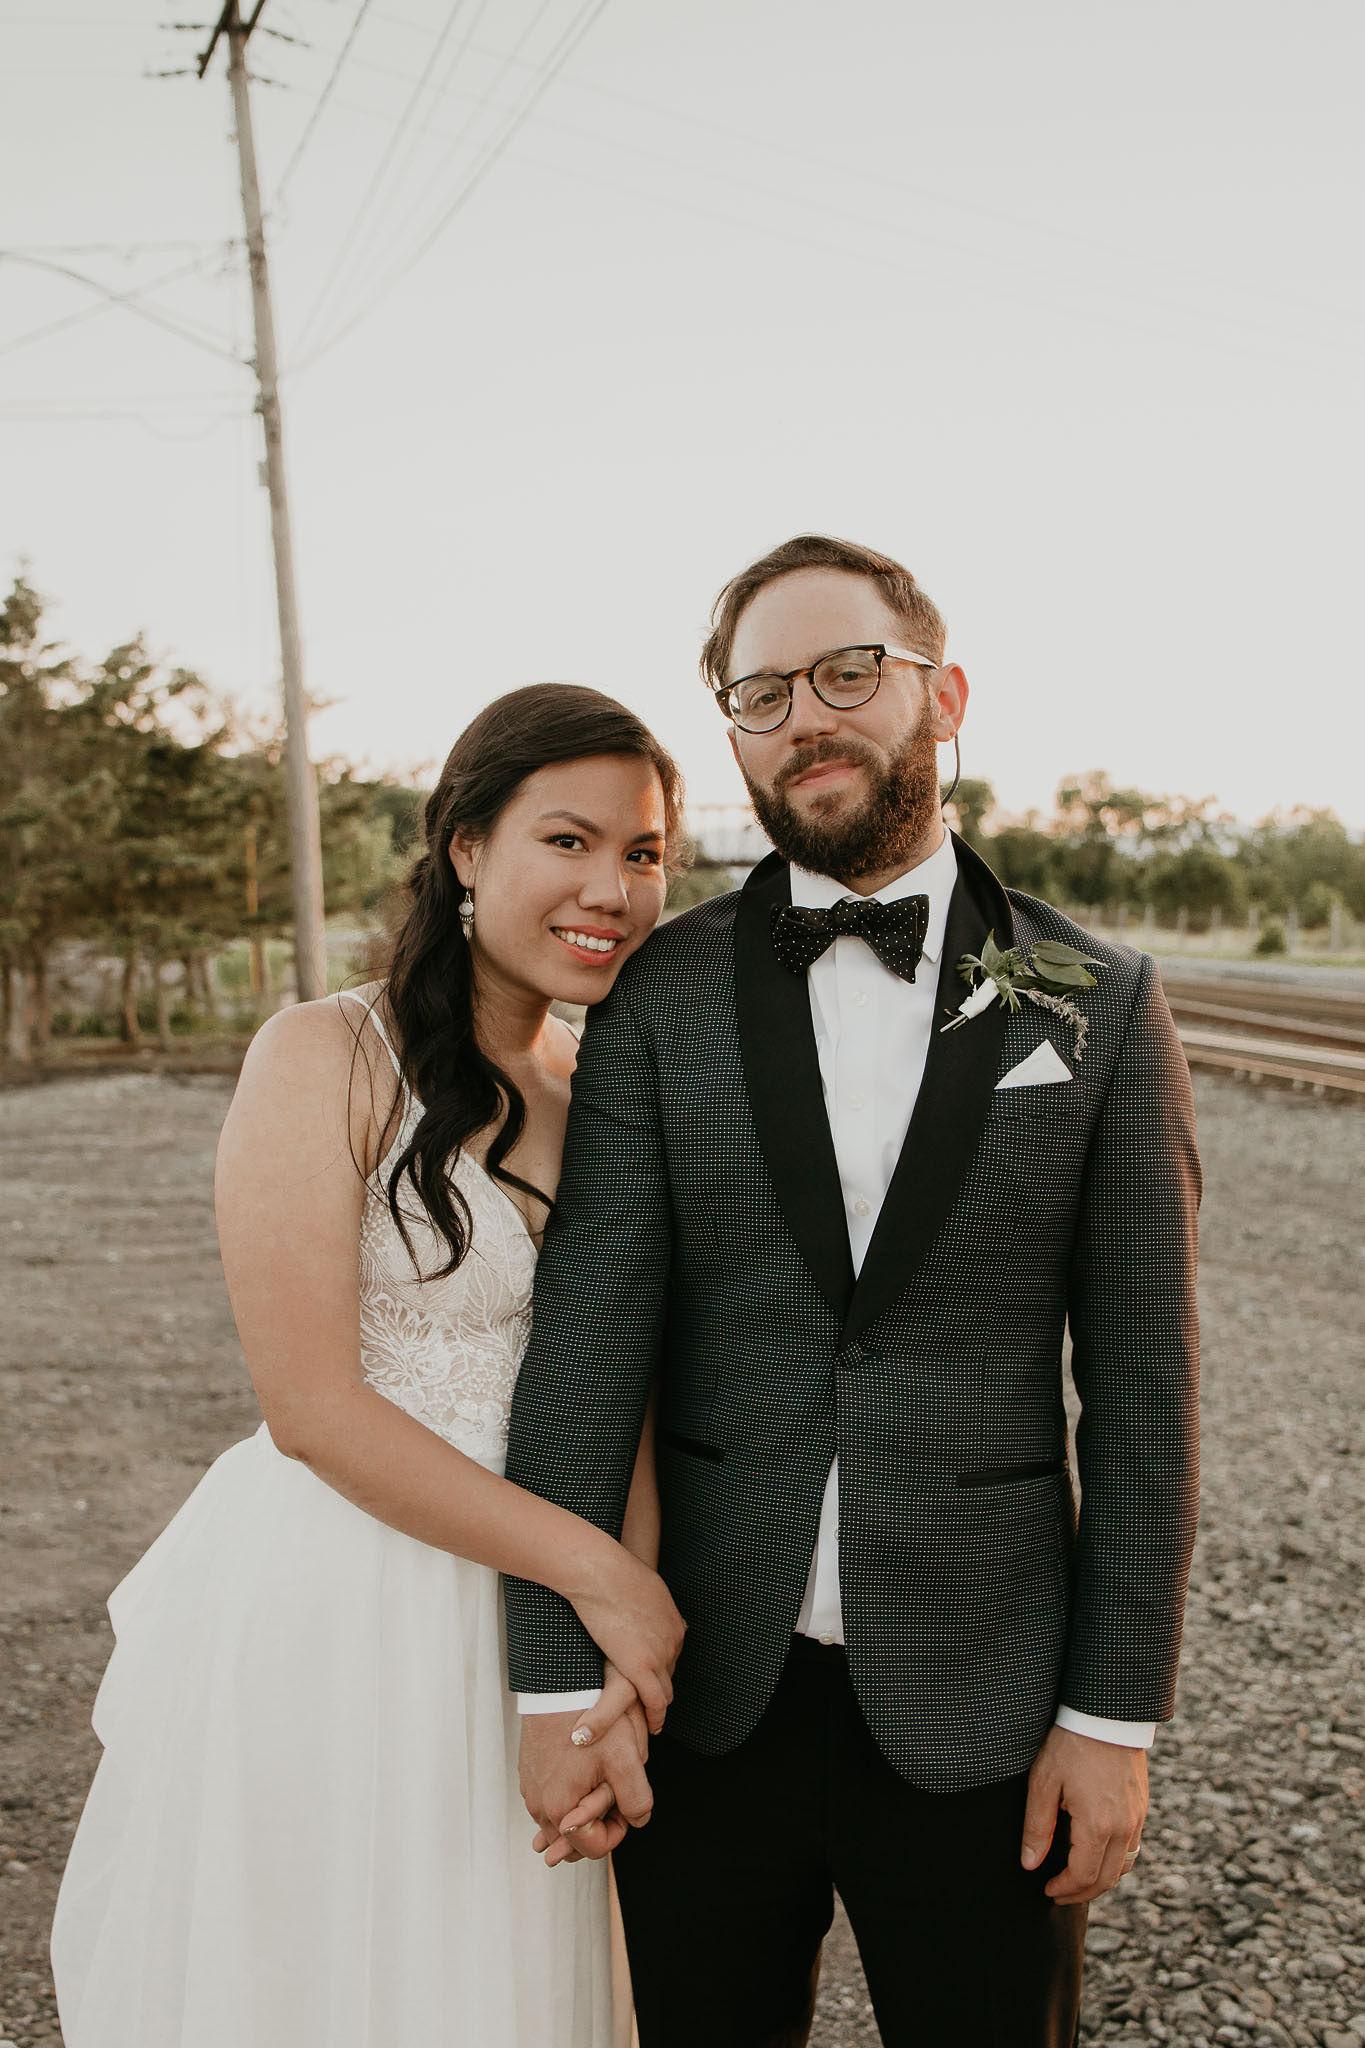 Jess+Matt_wedding-396.JPG